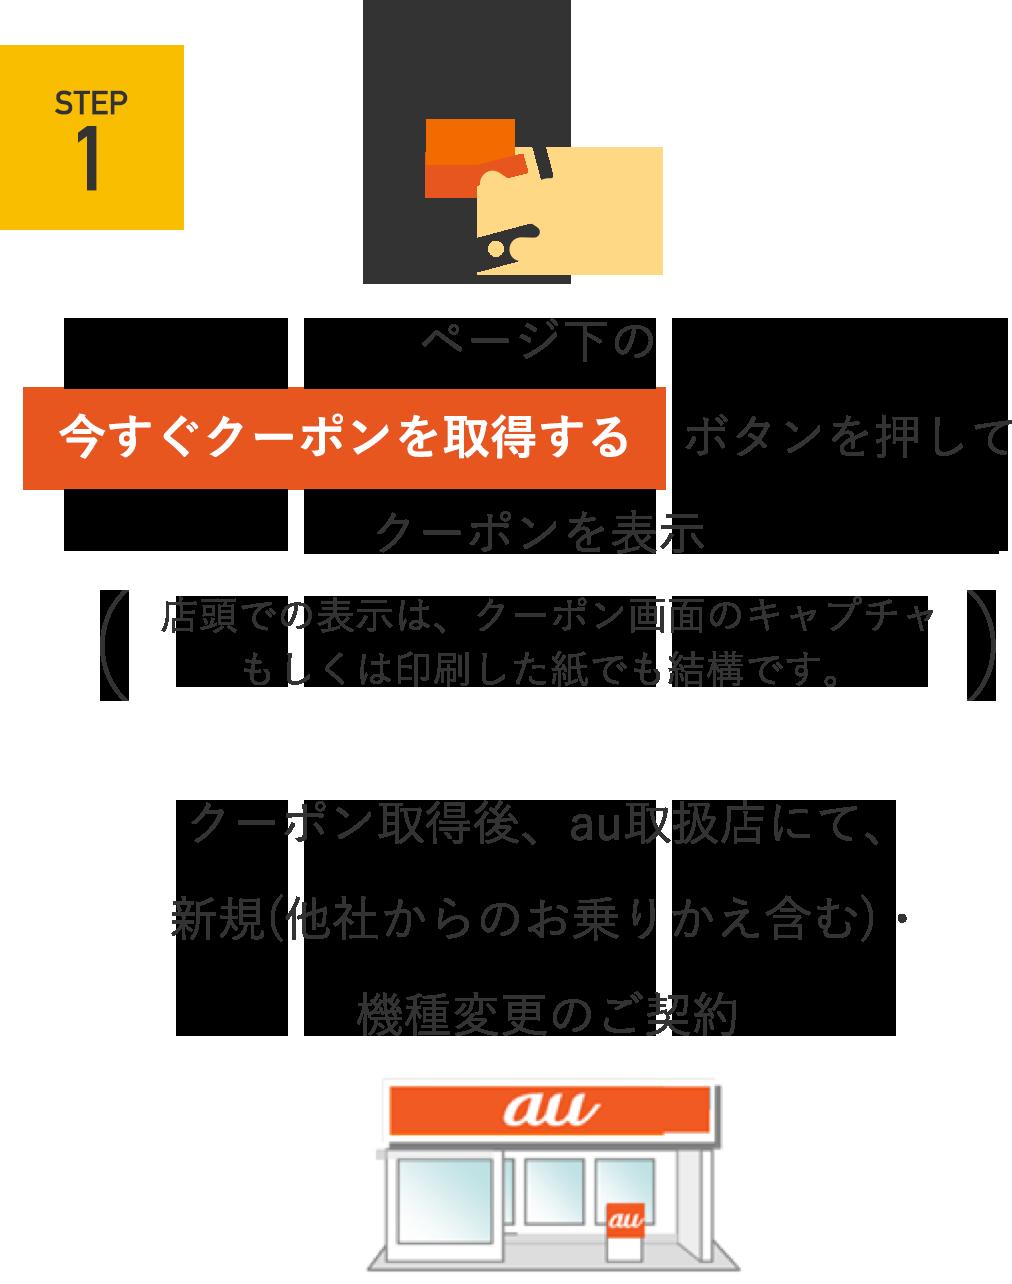 STEP1 ページ下の[今すぐクーポンを取得する]ボタンを押してクーポンを表示(店頭での表示は、クーポン画面のキャプチャもしくは印刷した紙でも結構です。)クーポン取得後、au取扱店にて、新規(他社からの乗りかえ含む)・機種変更のご契約